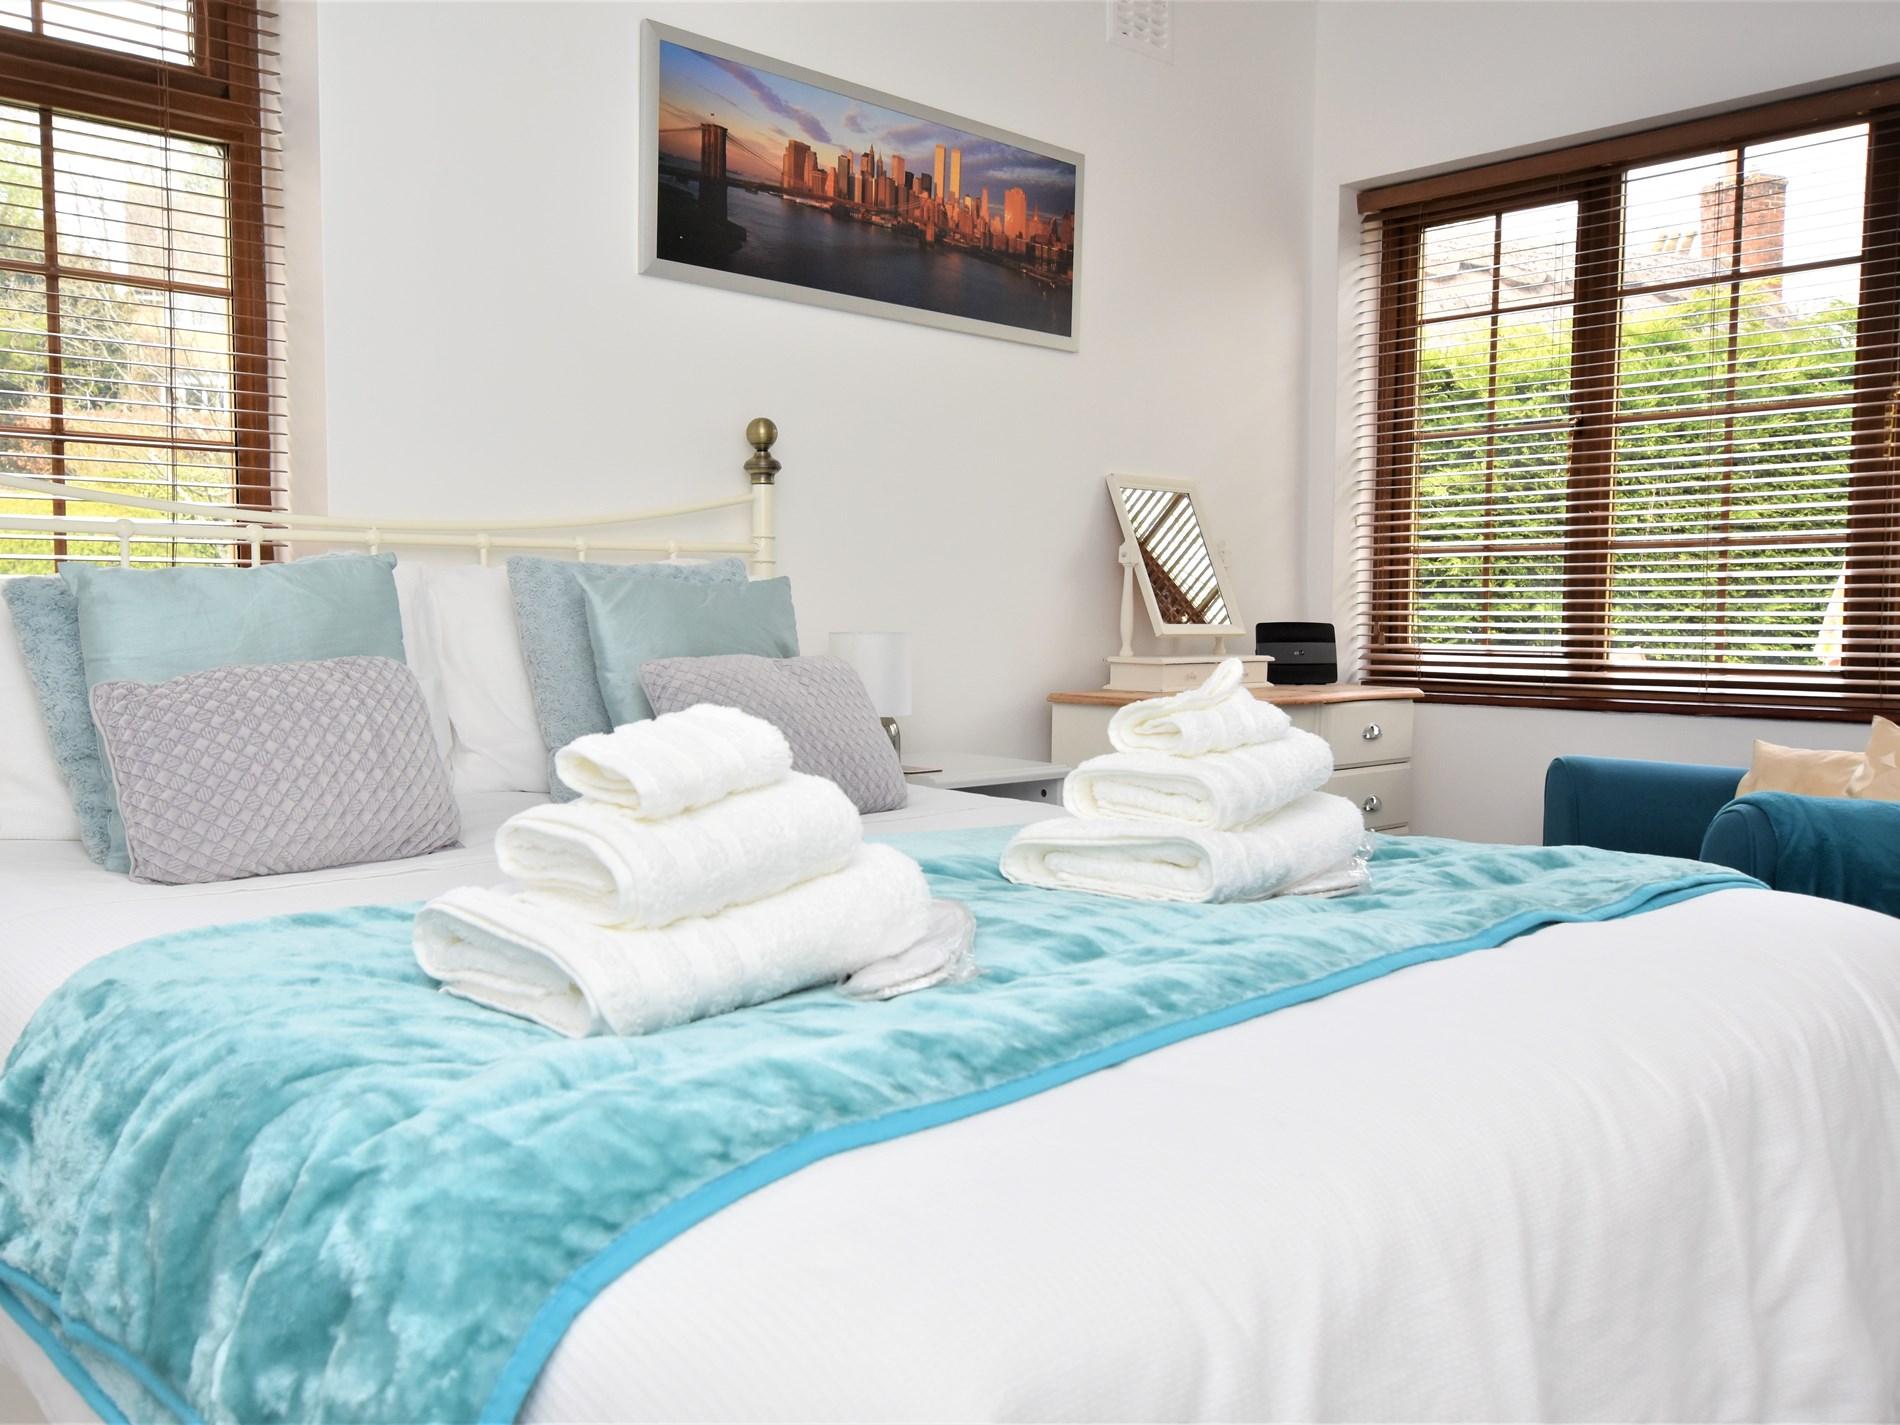 2 Bedroom Cottage in Warwick, Heart of England